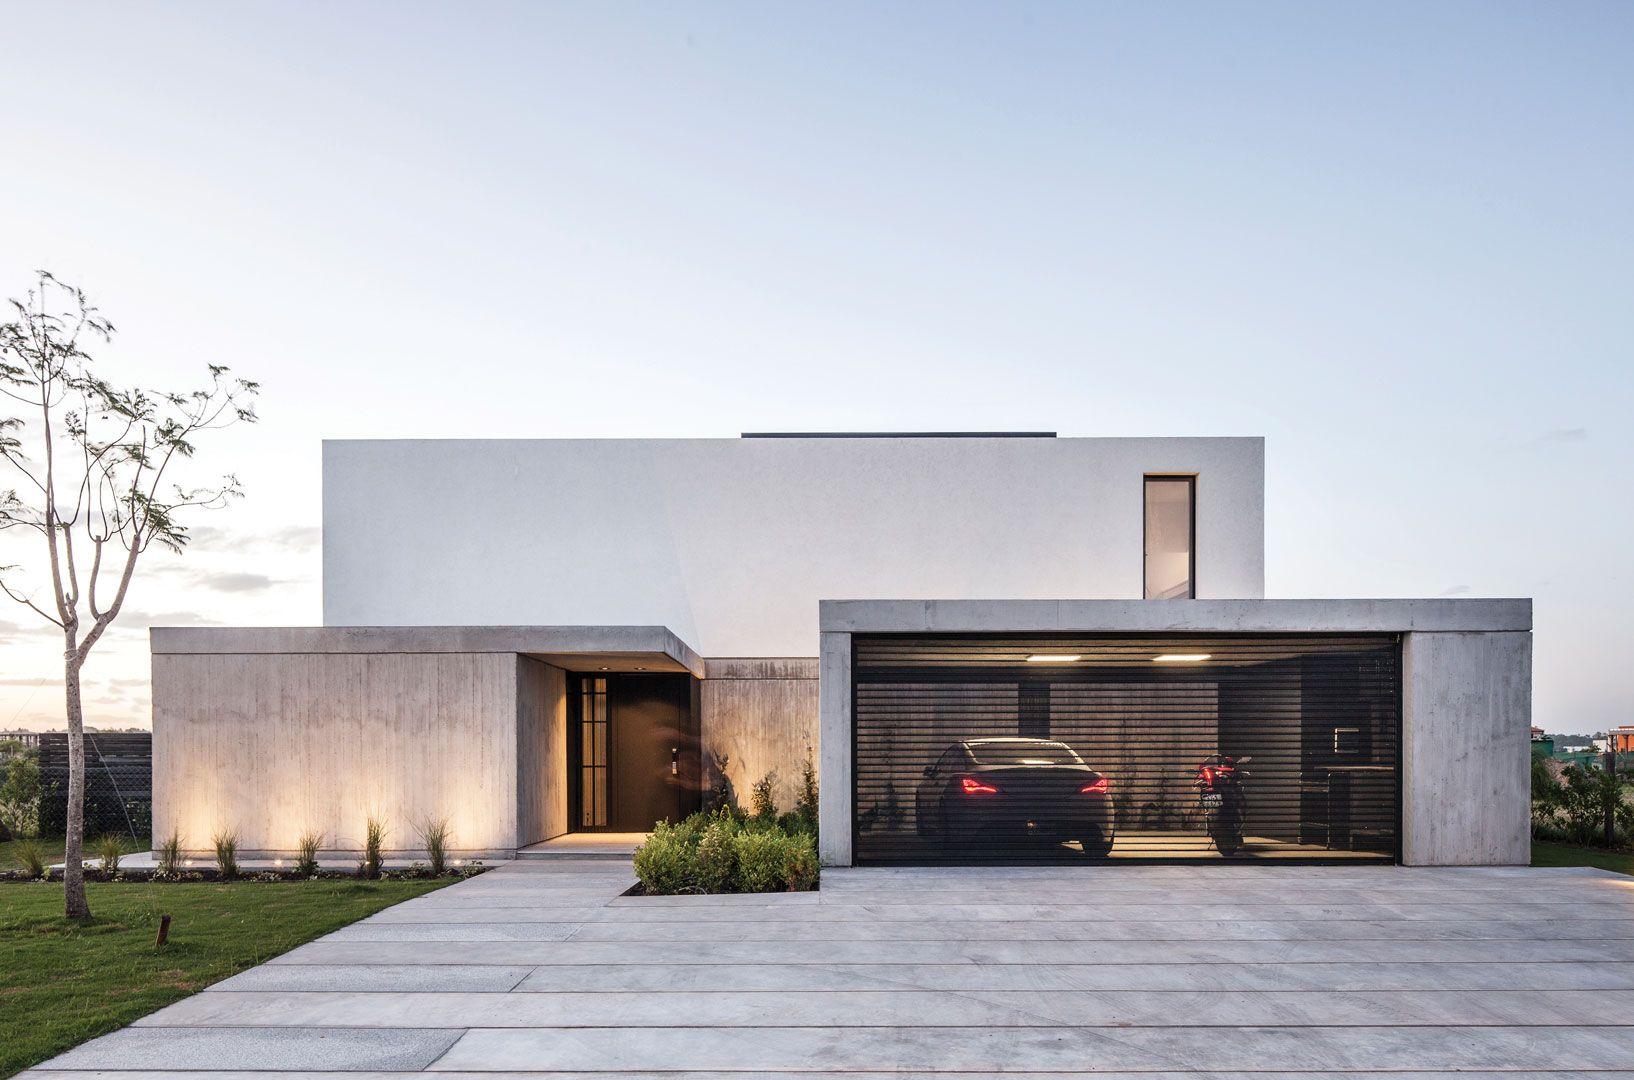 Gmarq govetto mansilla arquitectos mansilla casa estilo for Estilos de casas arquitectura